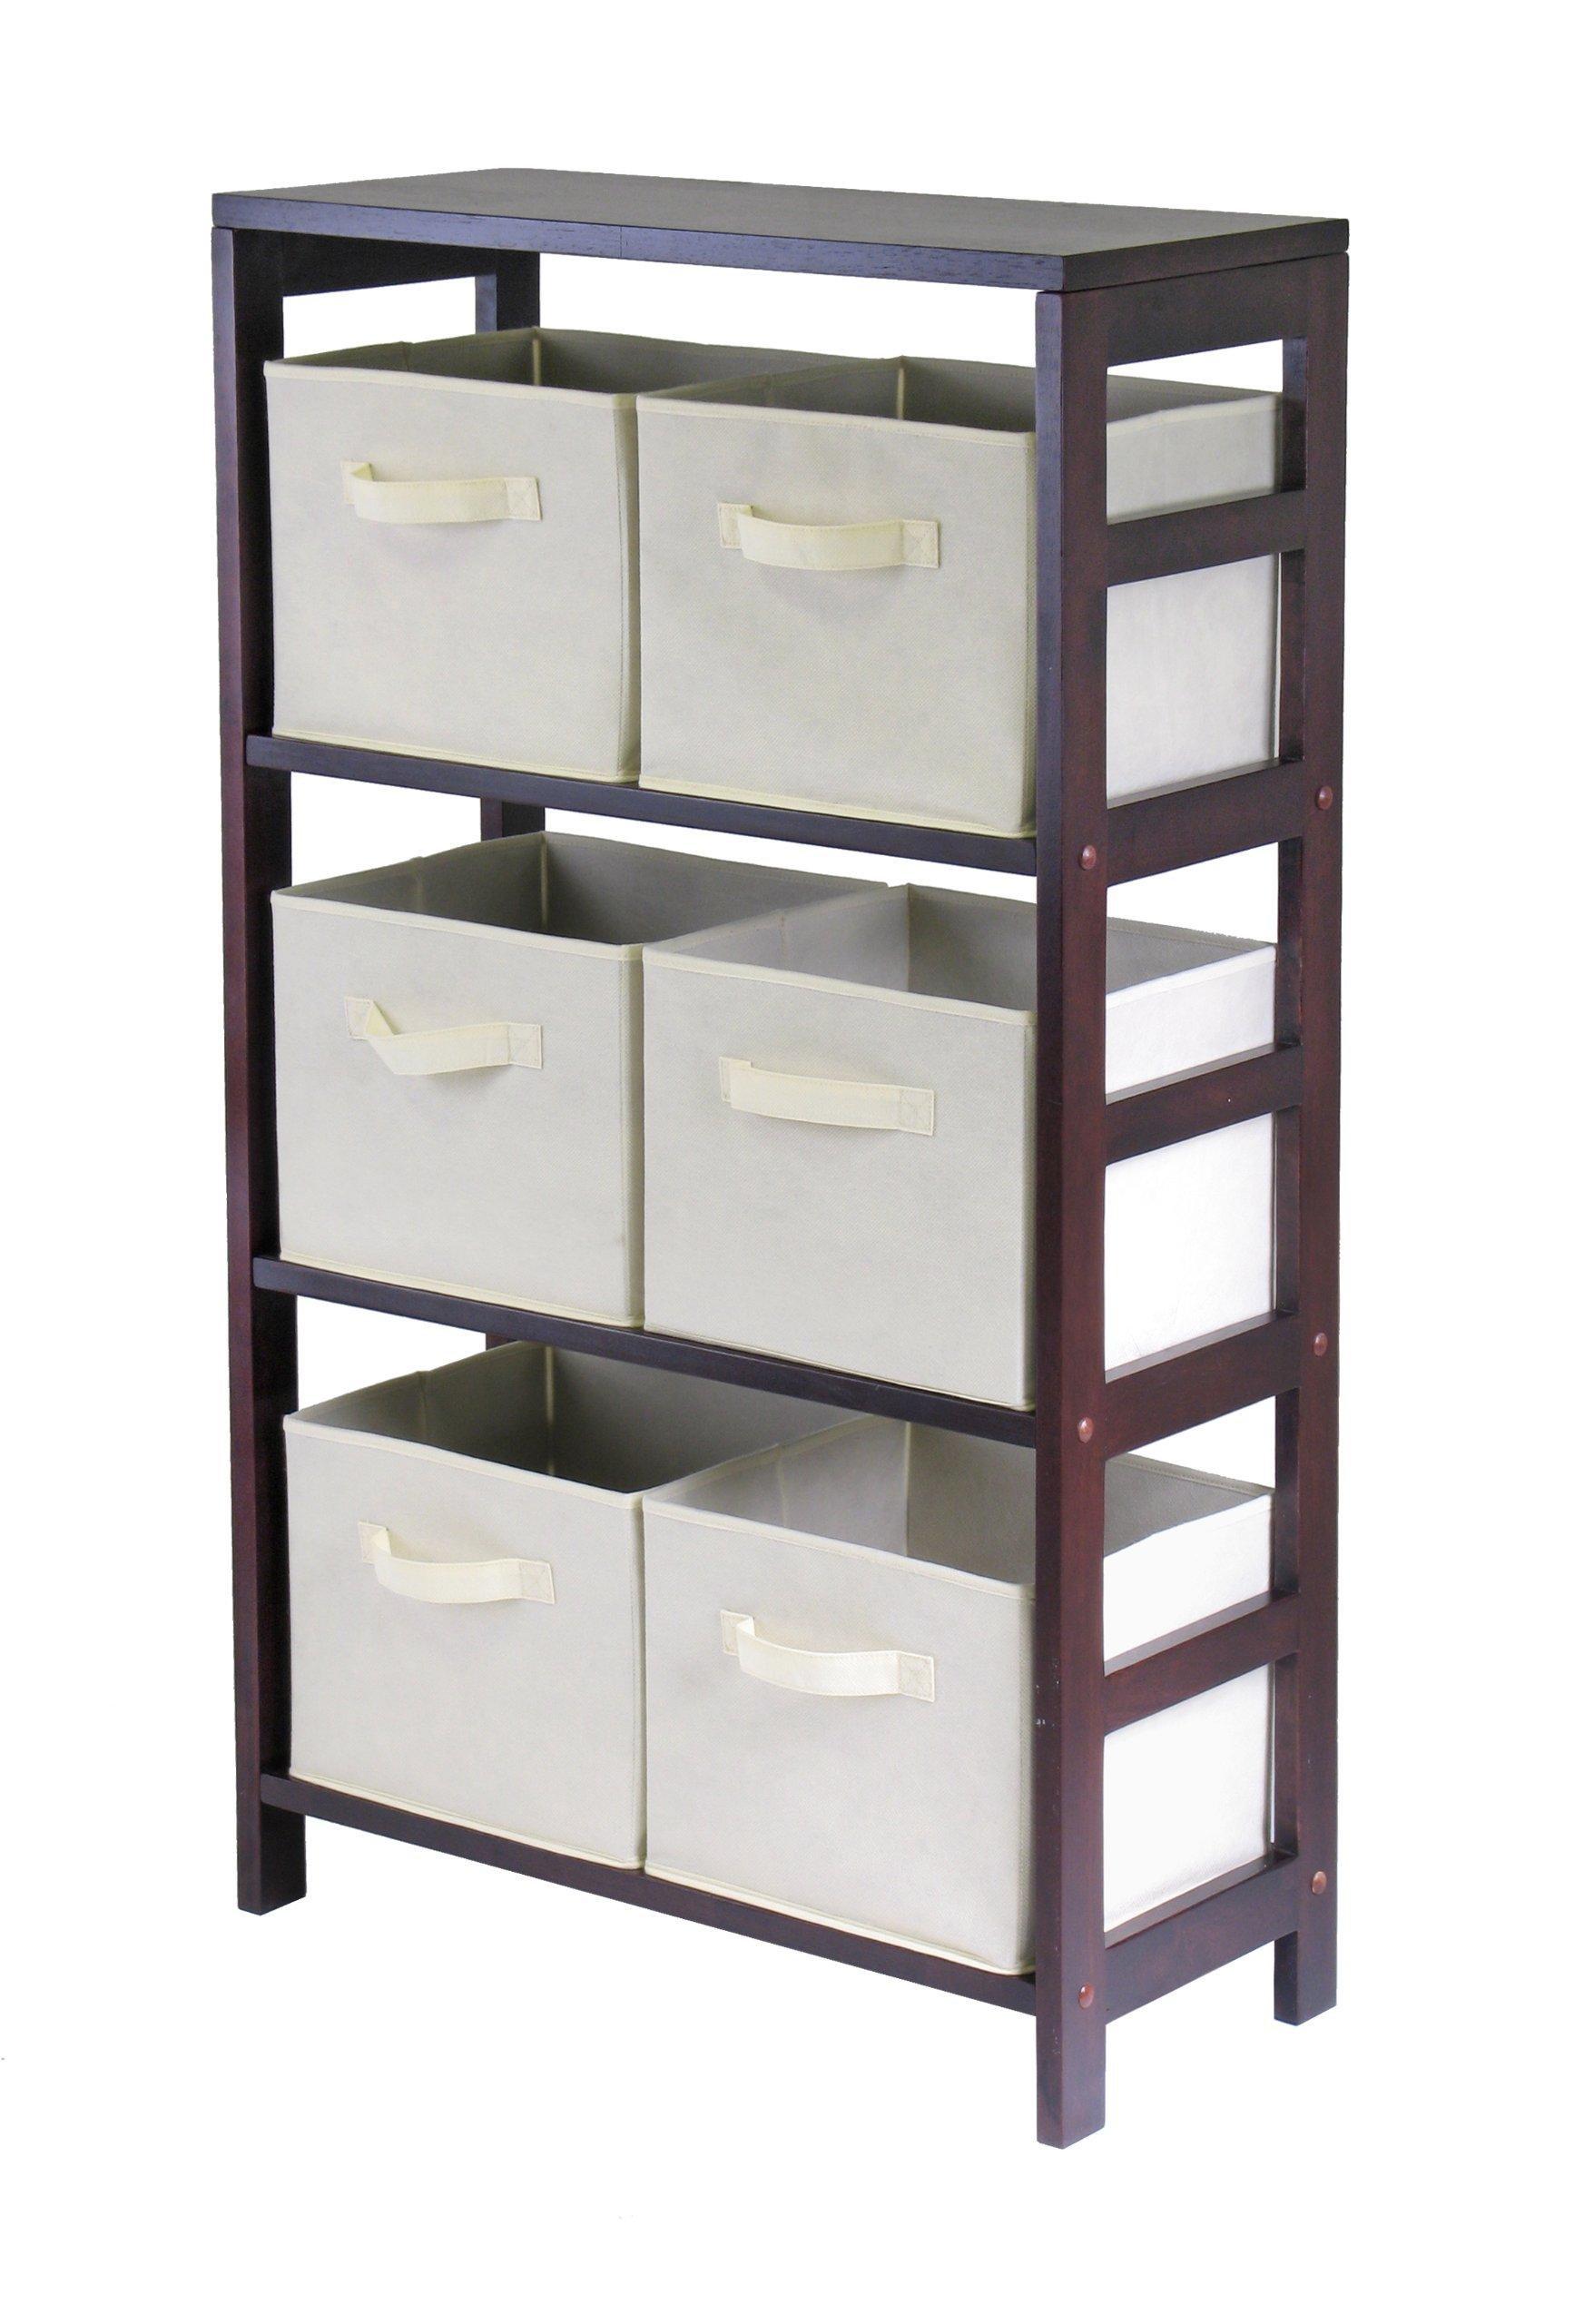 Winsome Wood Capri Wood 3 Section Storage Shelf with 6 Beige Fabric Foldable Baskets